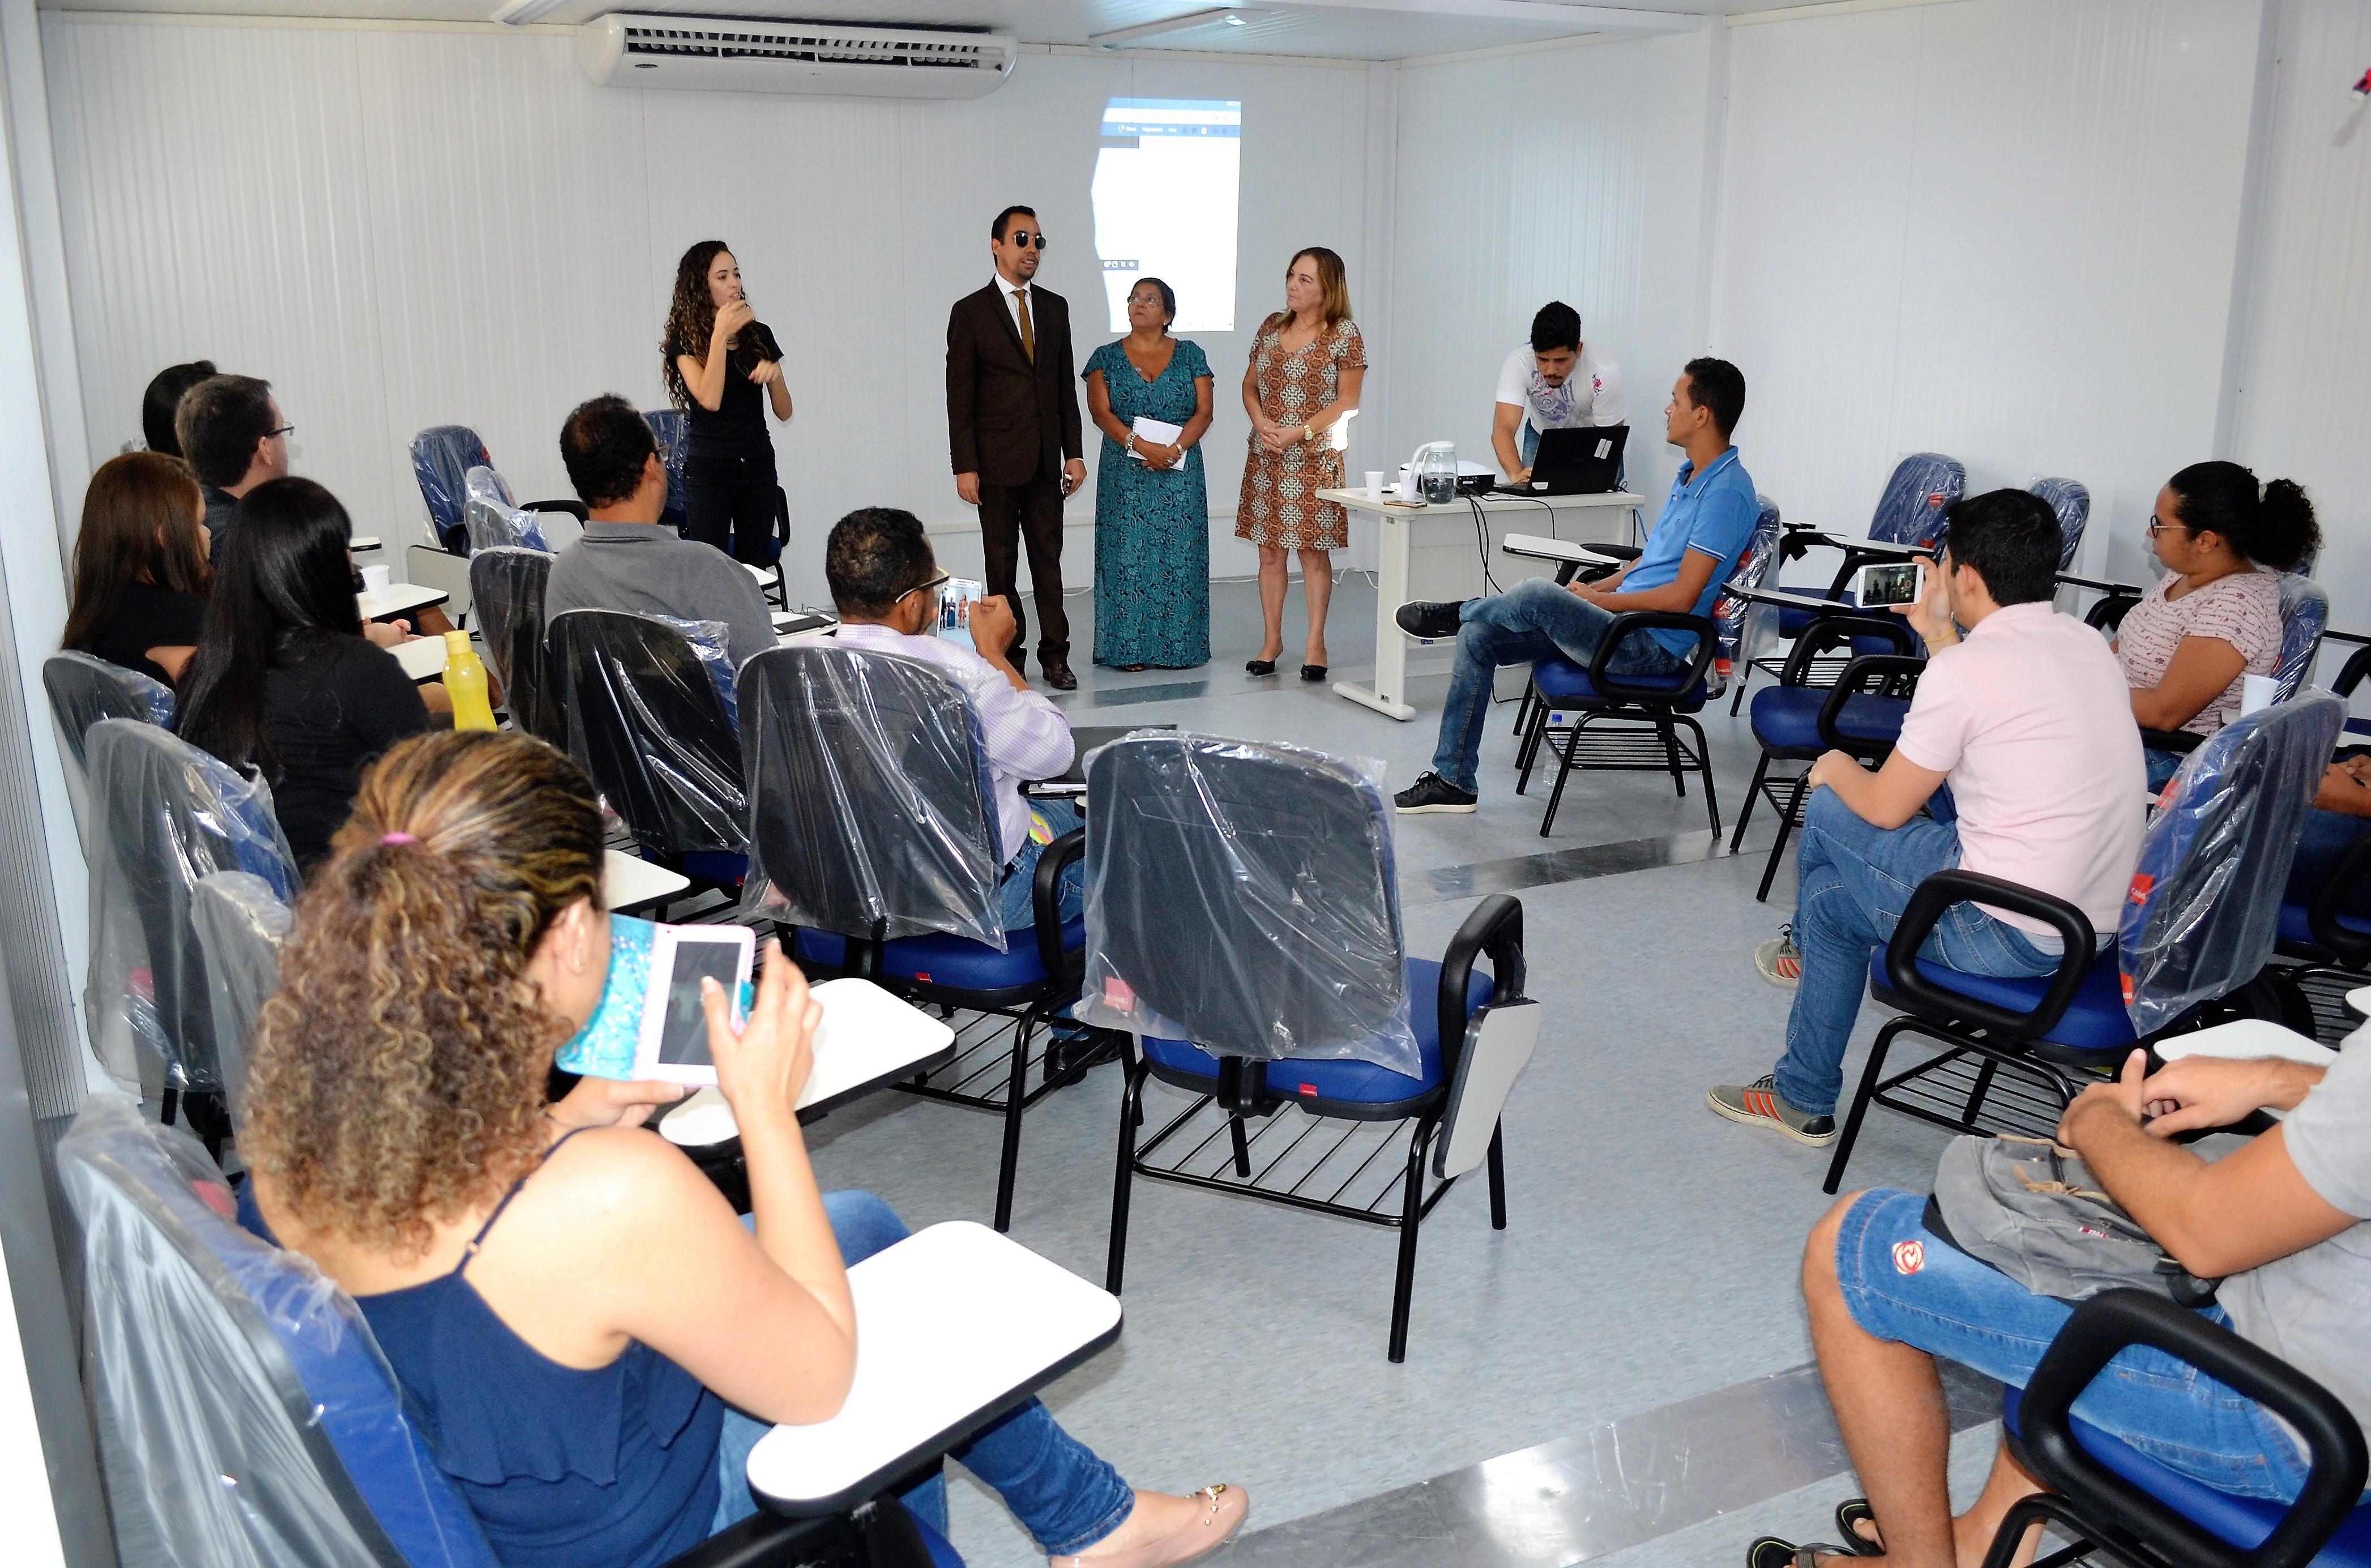 #PraCegoVer - Lucas, professores e alunos da UFS reunidos no Departamento de Letras Libras